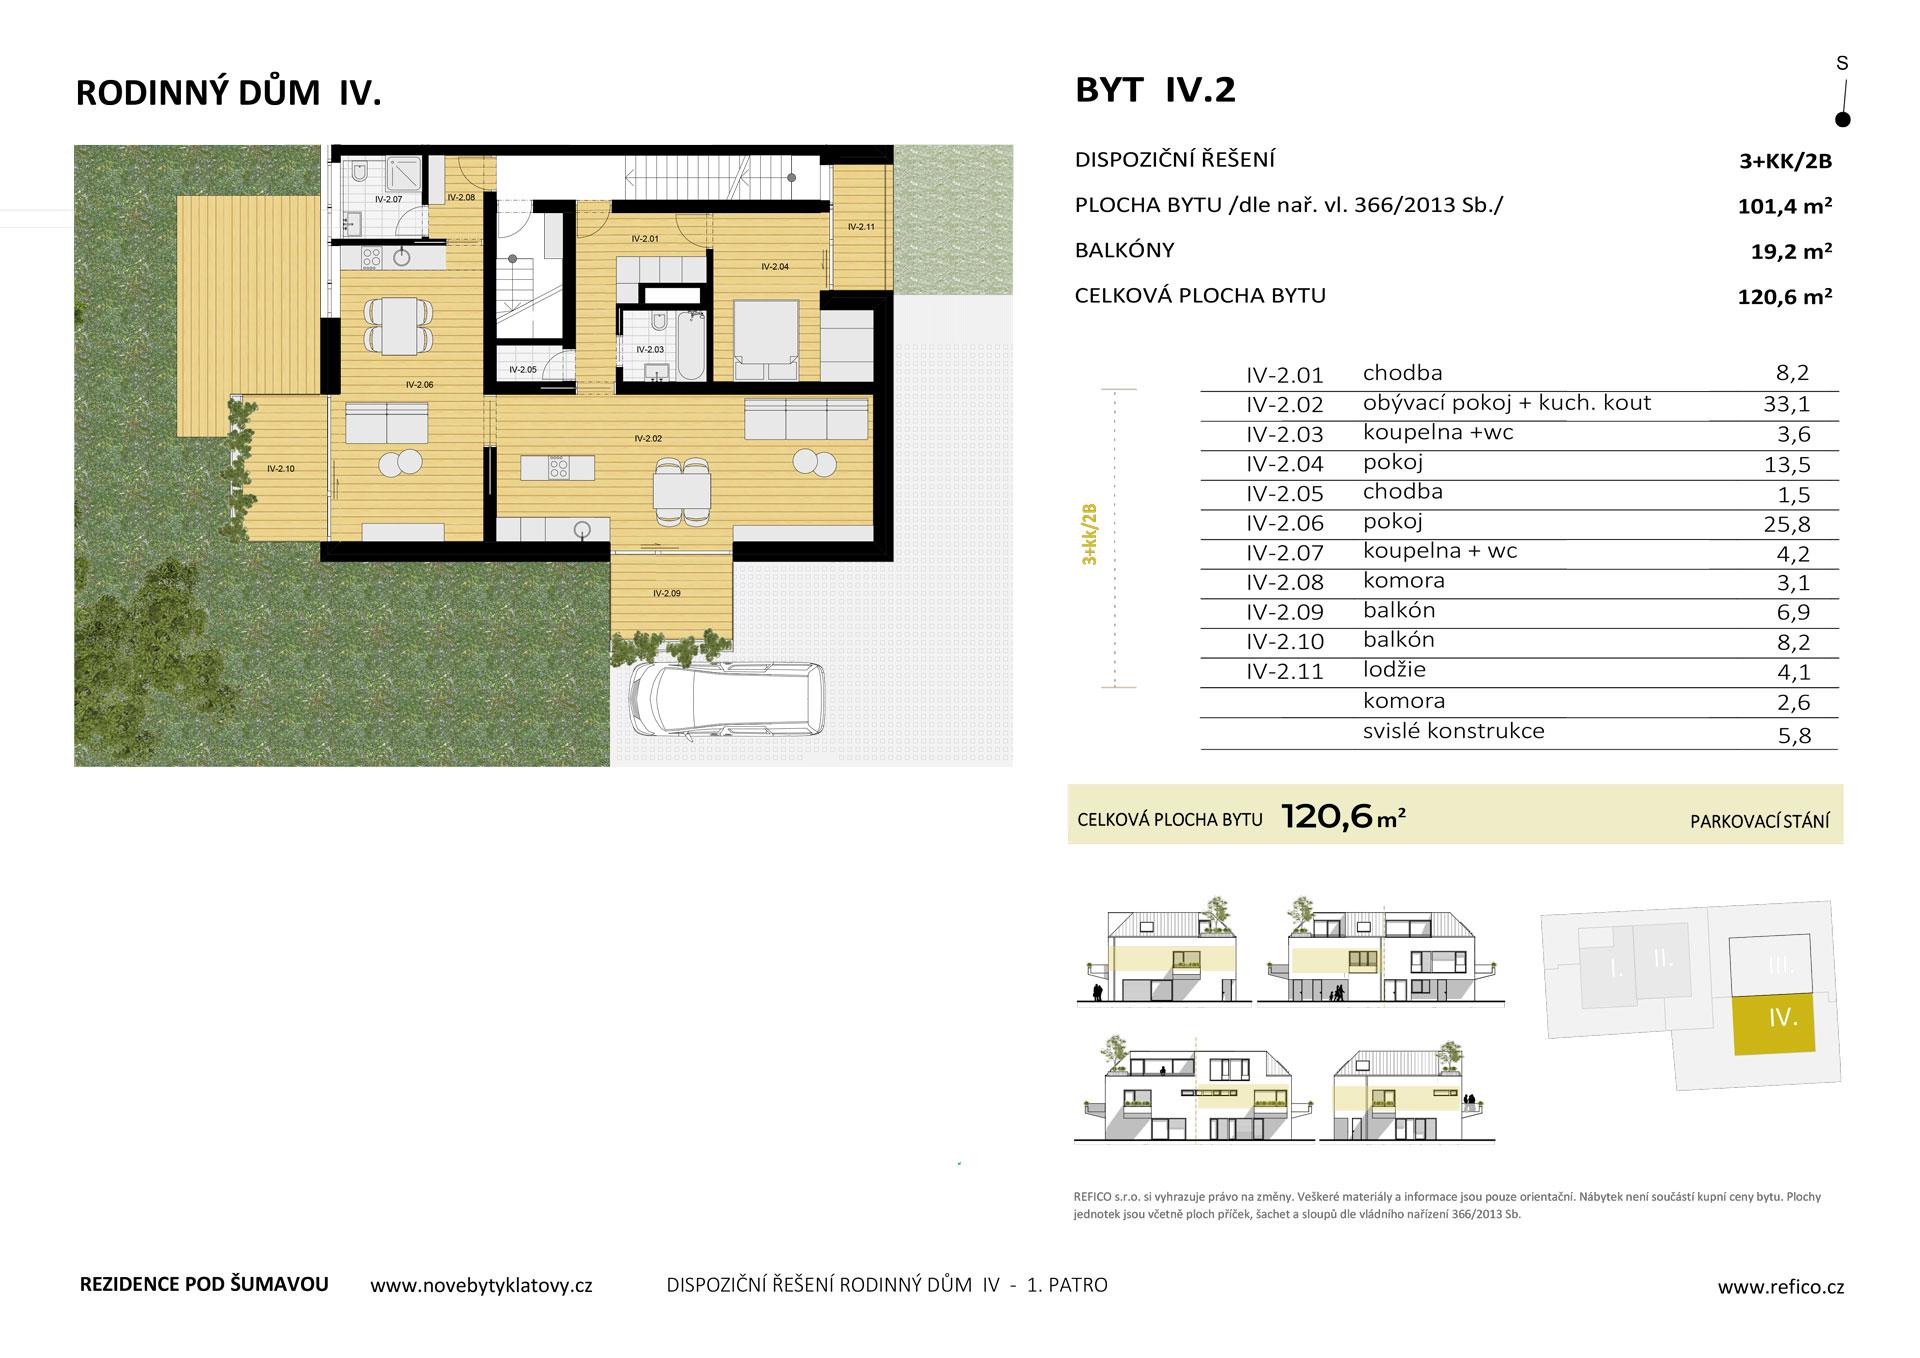 Dům IV., byt 2, 1. patro, dvougenerační byt 3+KK/2B, alt. 2+KK/B + garsoniéra/B